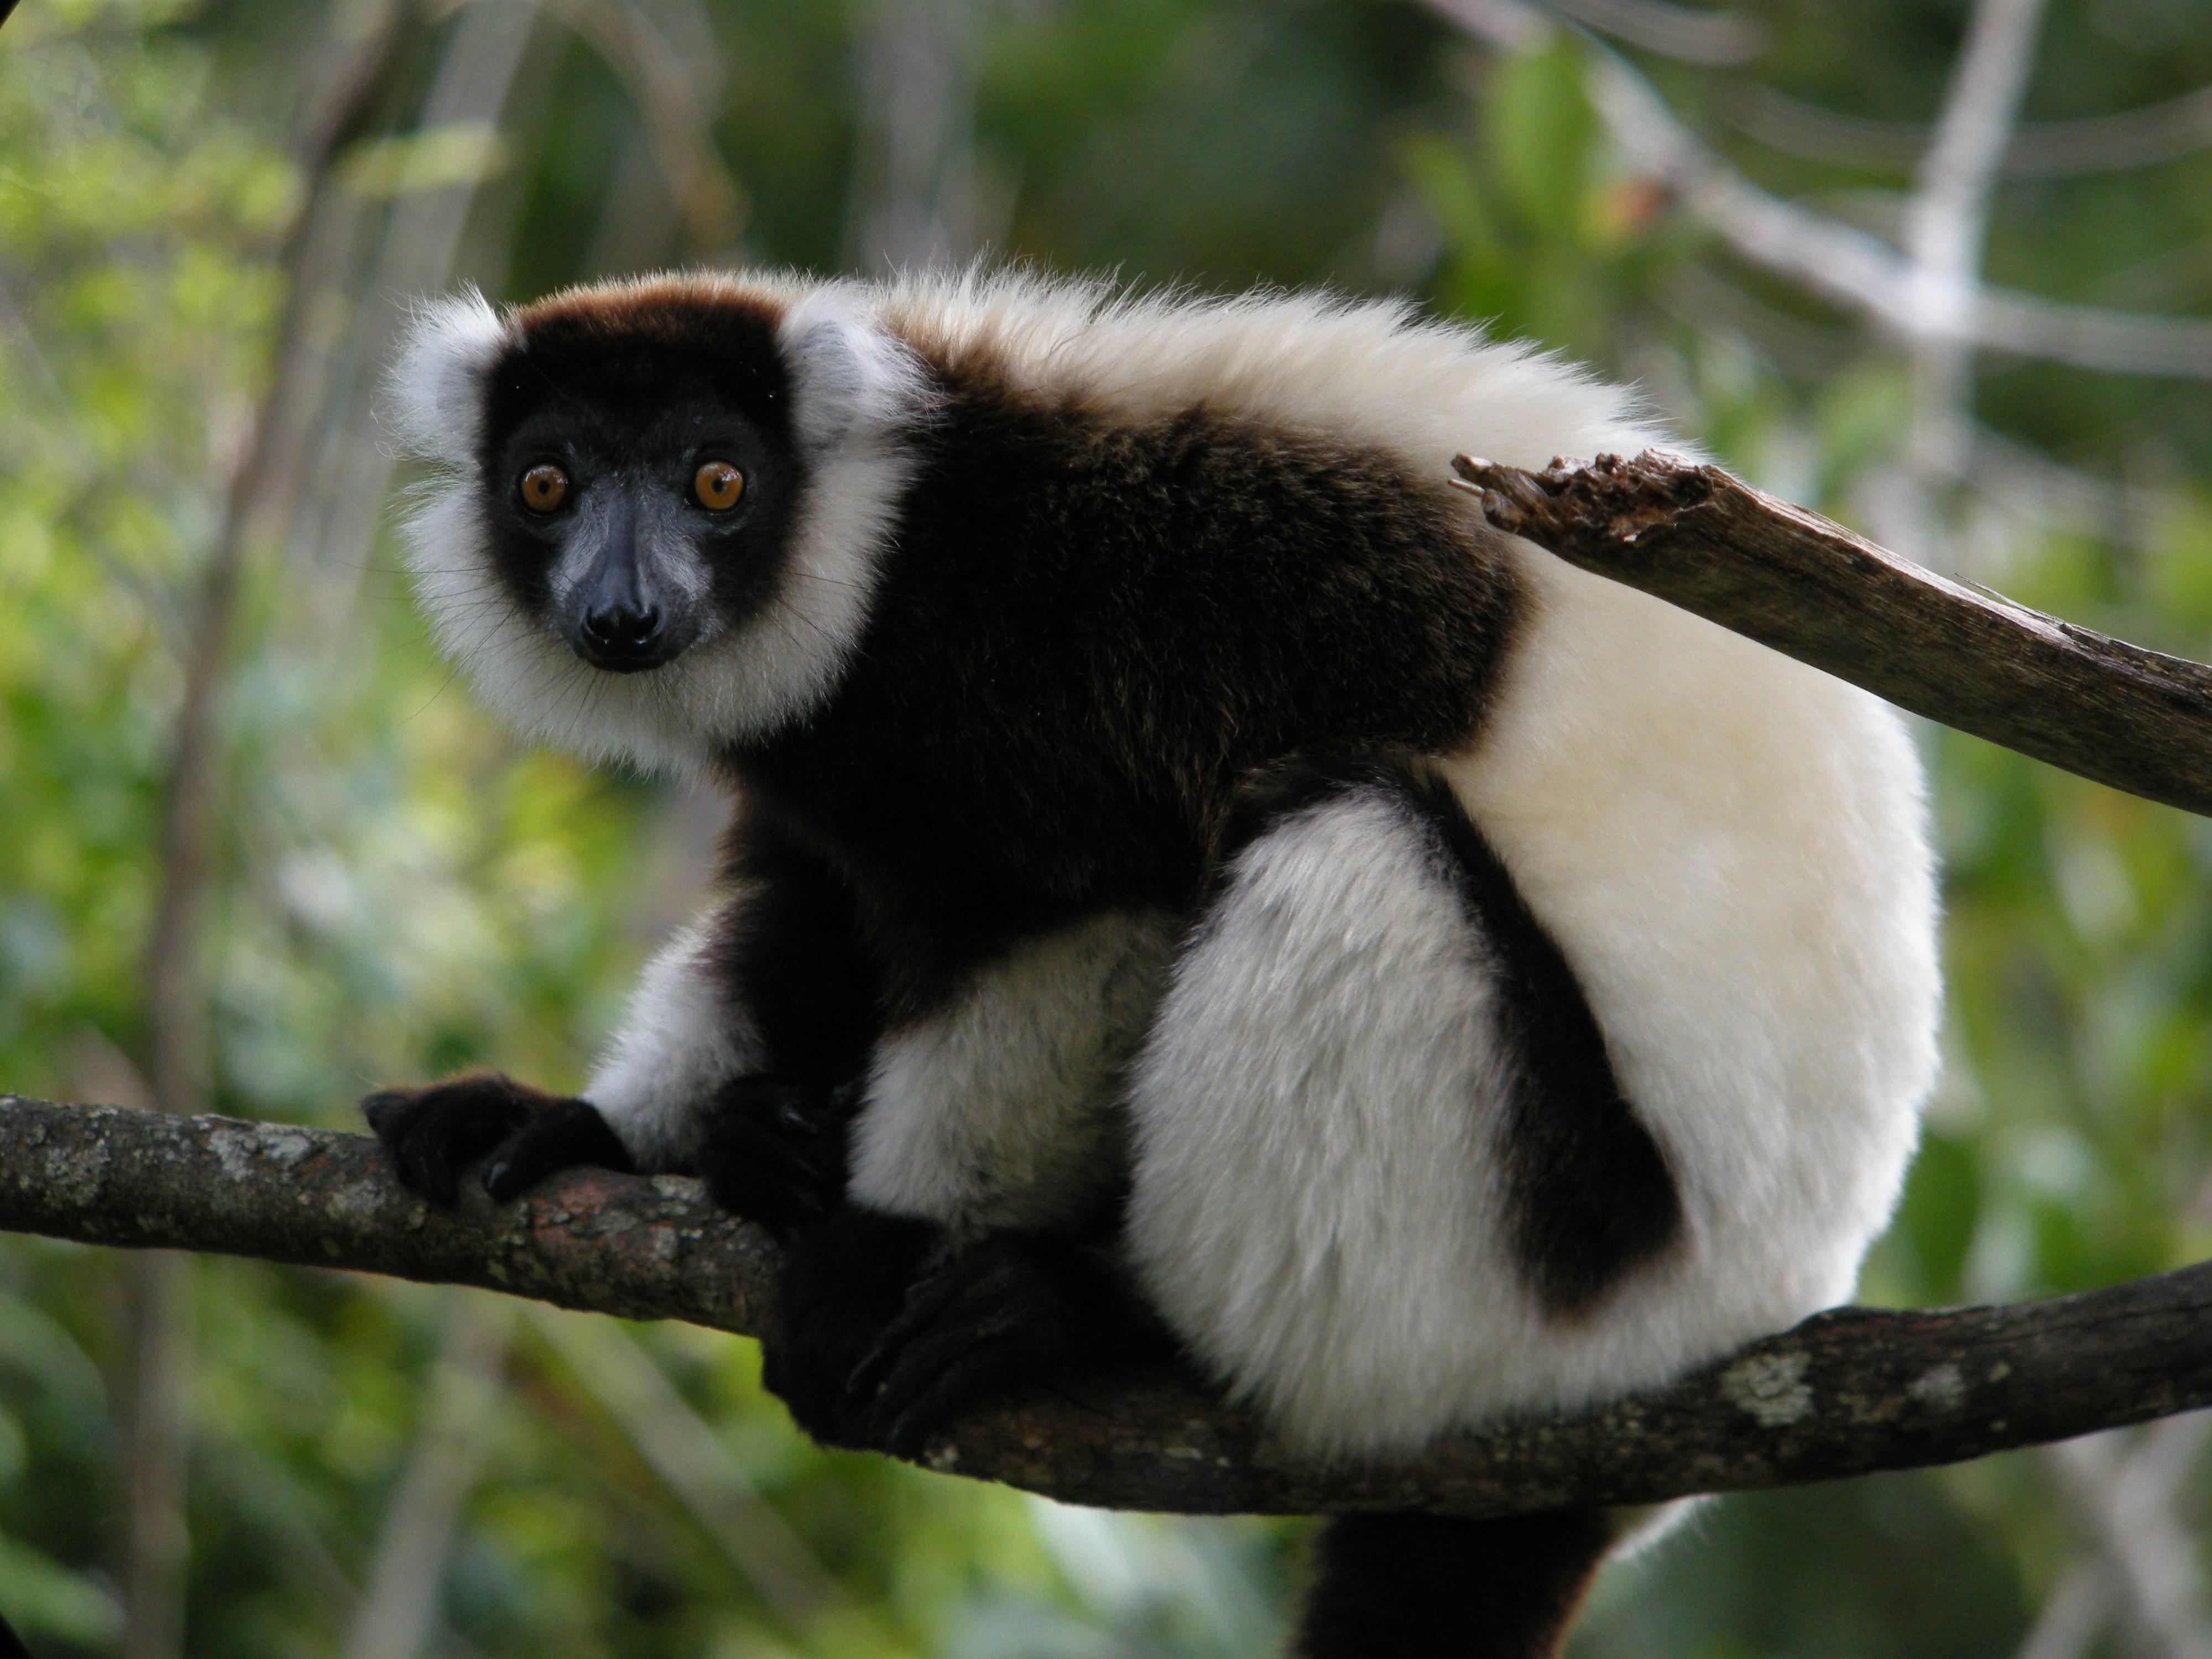 https://upload.wikimedia.org/wikipedia/commons/e/e0/Black-and-White_Ruffed_Lemur%2C_Mantadia%2C_Madagascar.jpg